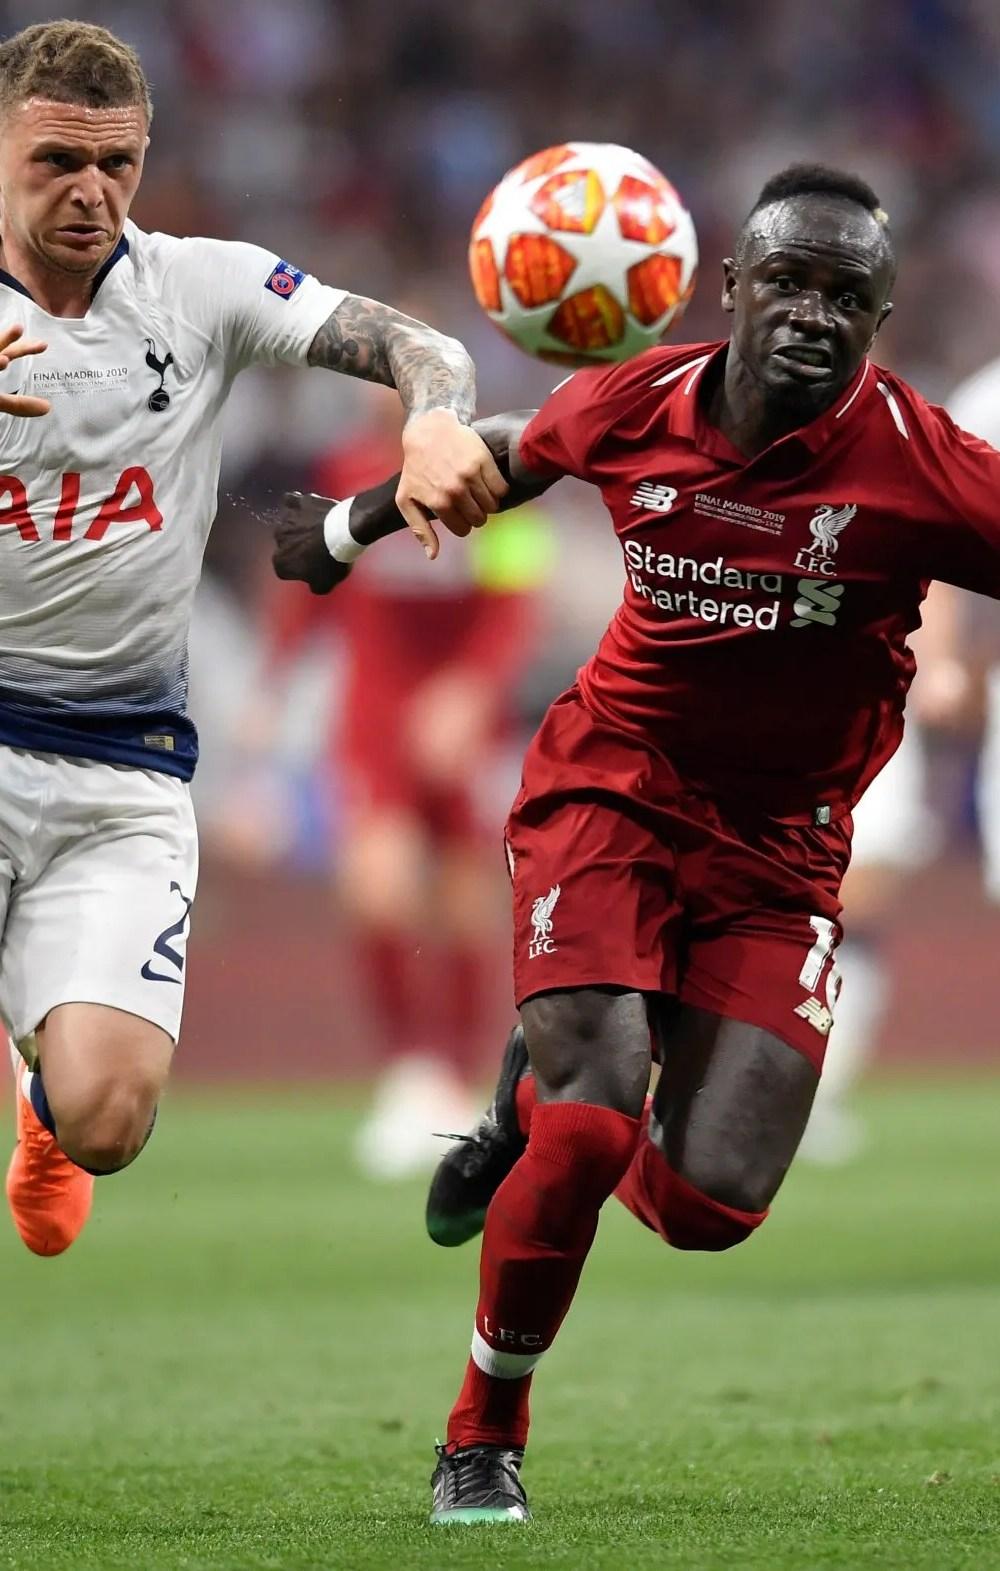 Kieran-Trippier-in-action-for-Tottenham-Hotspur